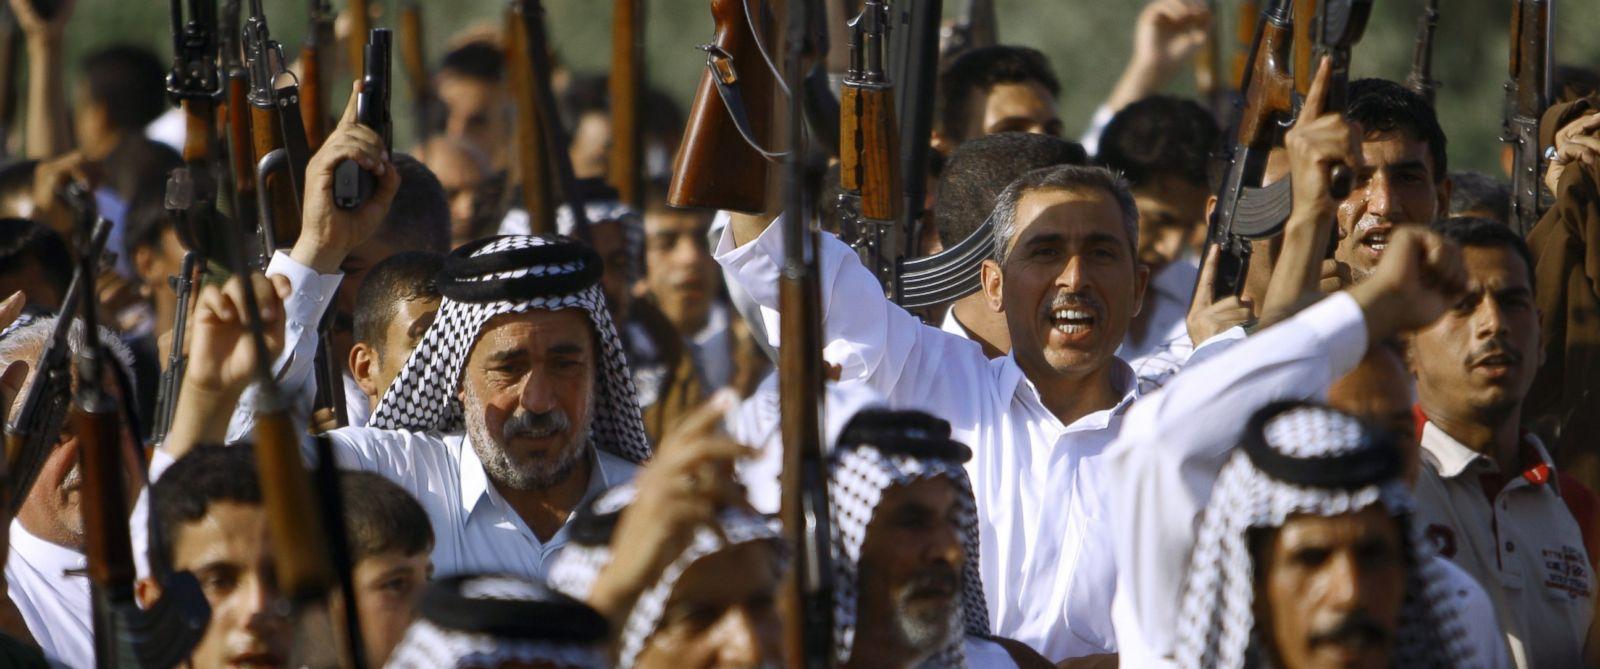 PHOTO: Iraqi Shiite tribesmen brandish their weapons, June 16 2014, in the southern Shiite Muslim shrine city of Najaf.